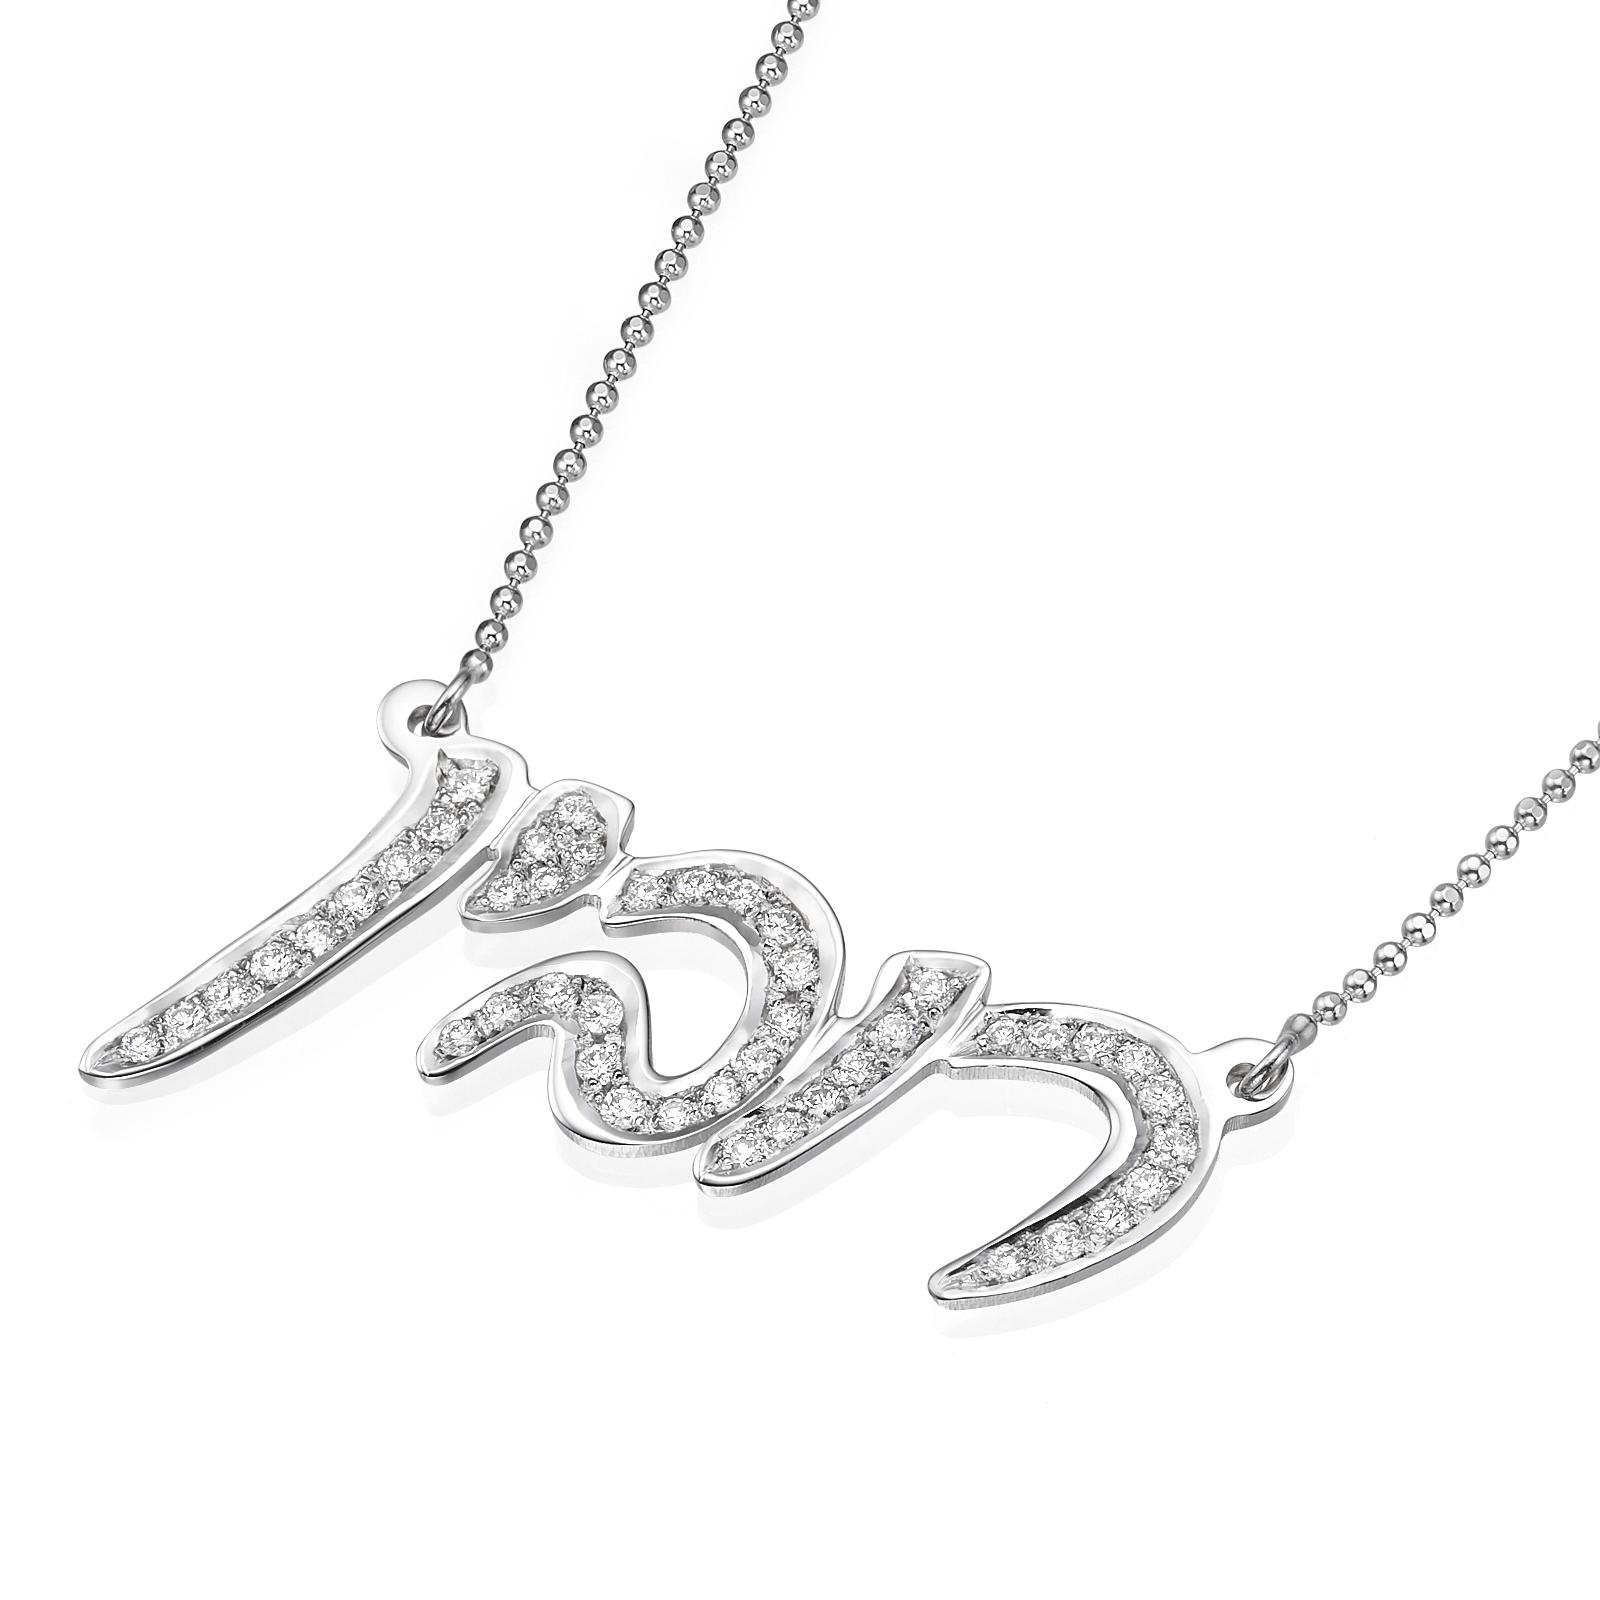 Hebrew Script Diamond Name Necklace - White Gold - Baltinester Jewelry